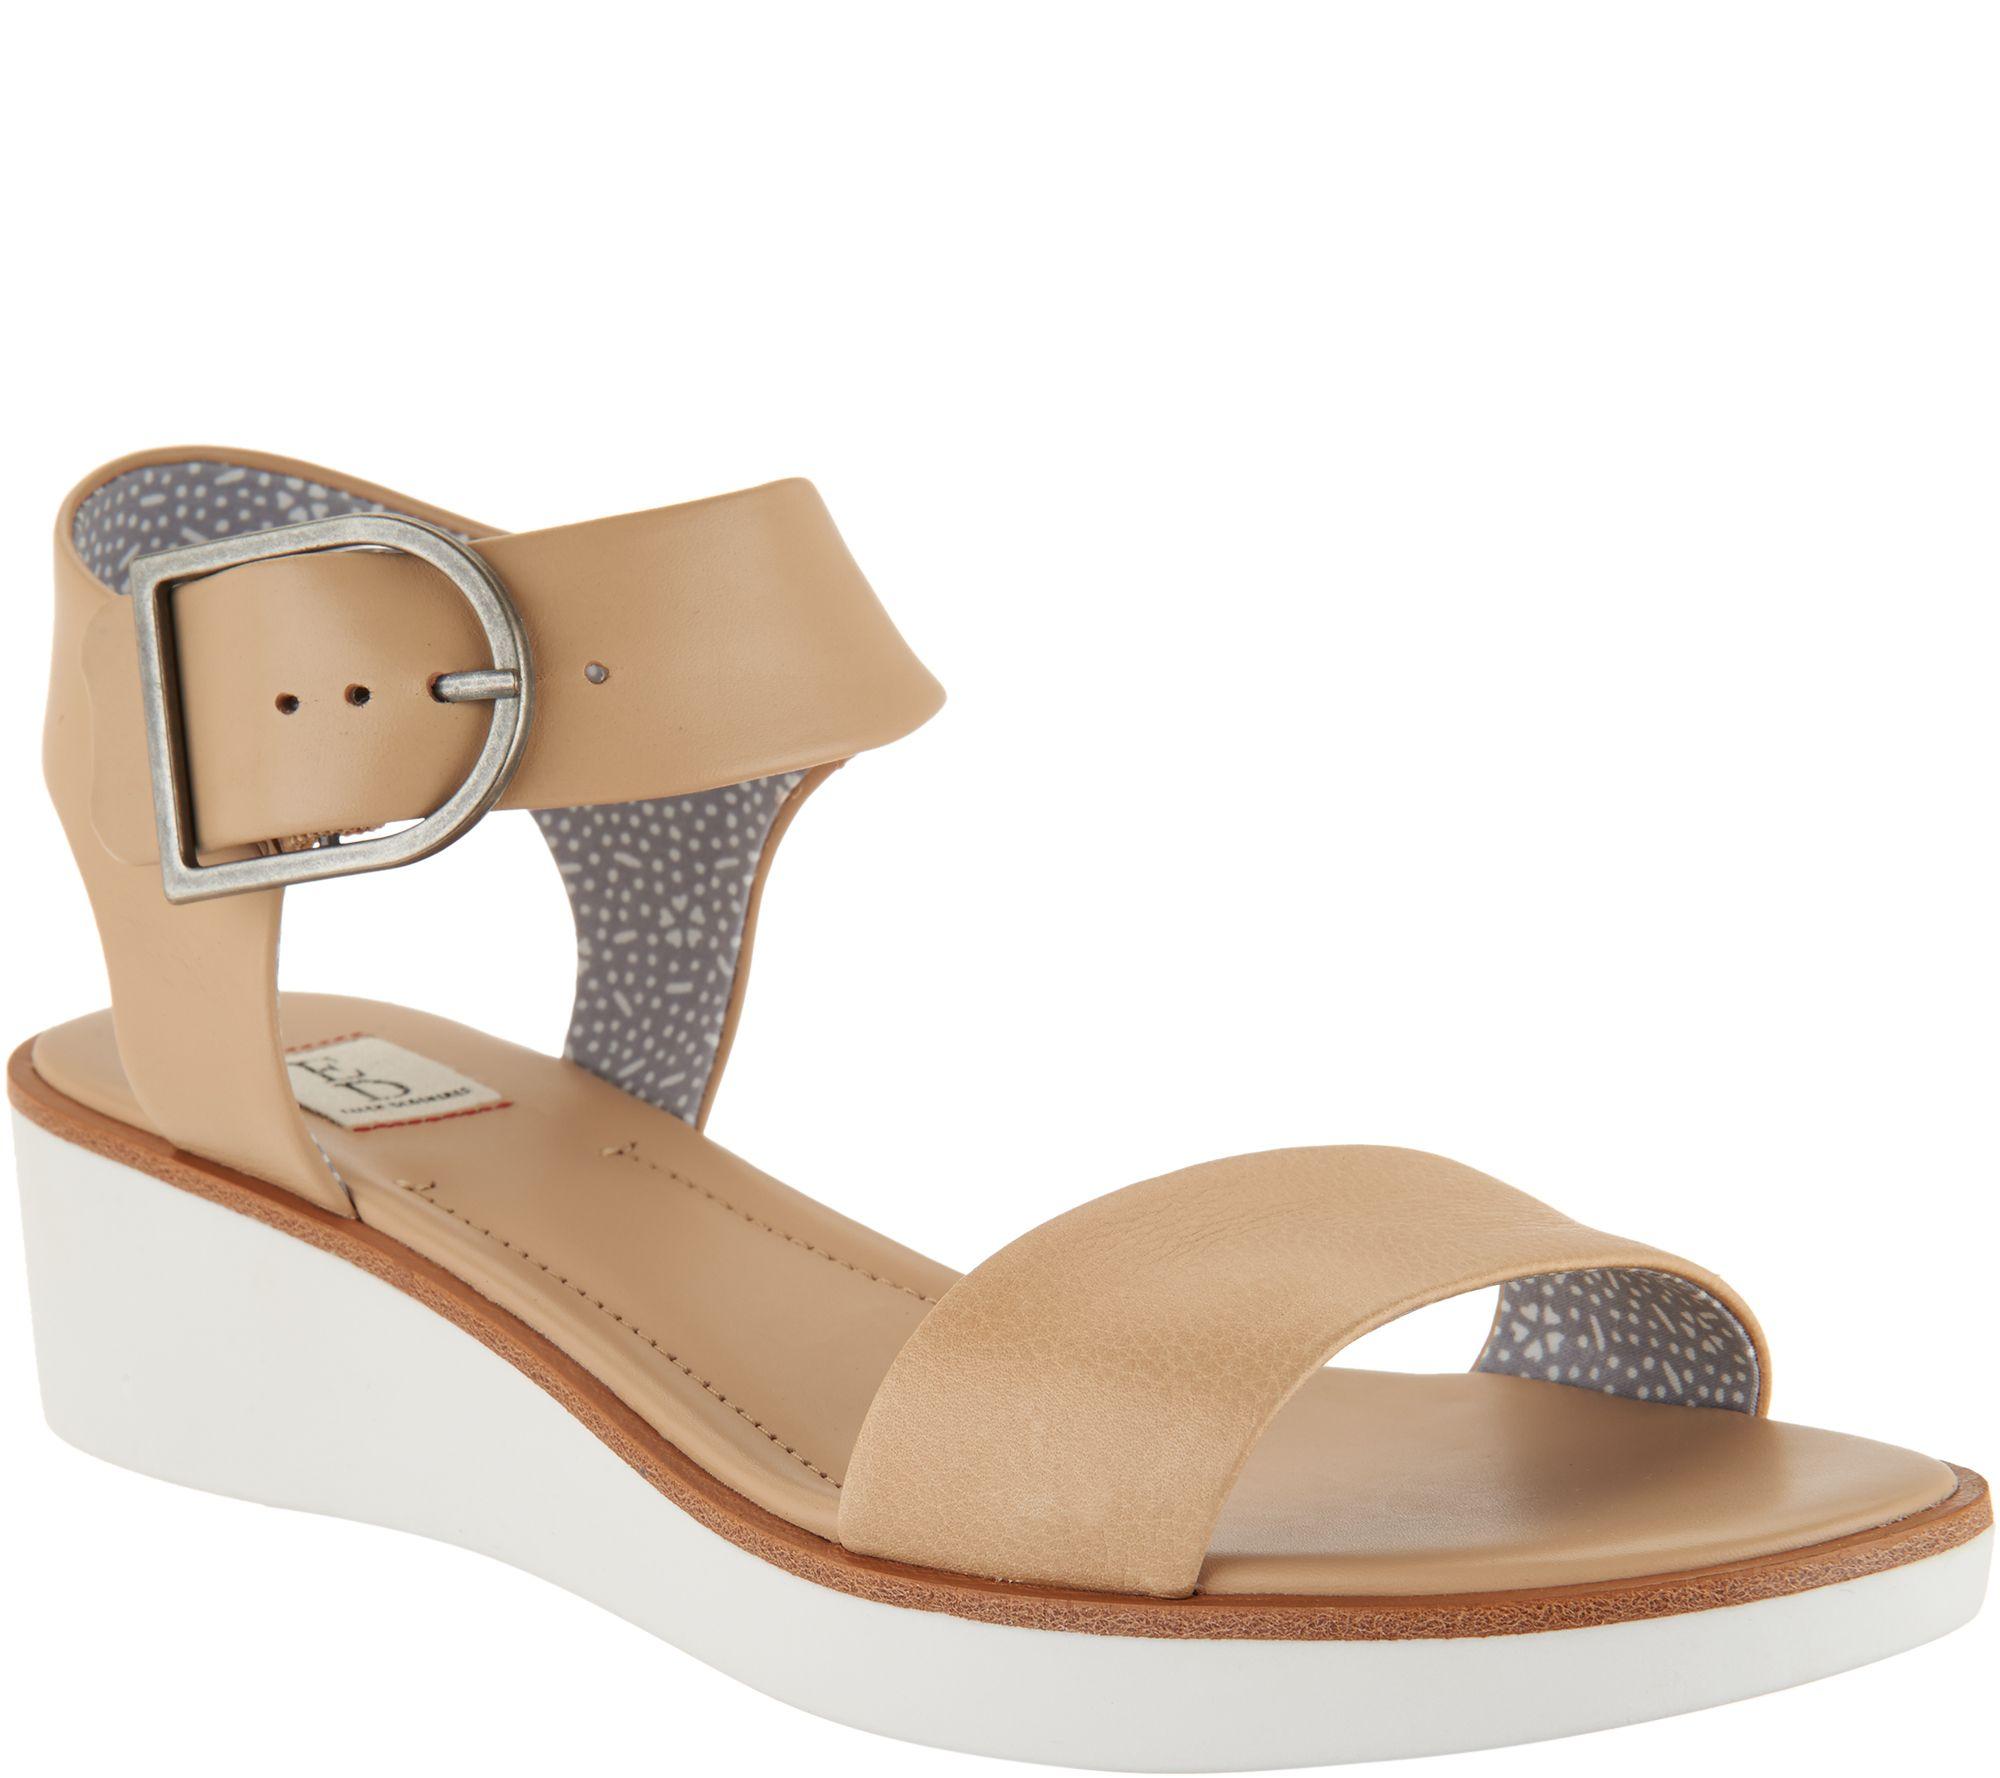 b798c800fd6 ED Ellen DeGeneres Leather Wedge Sandals - Stella - Page 1 — QVC.com